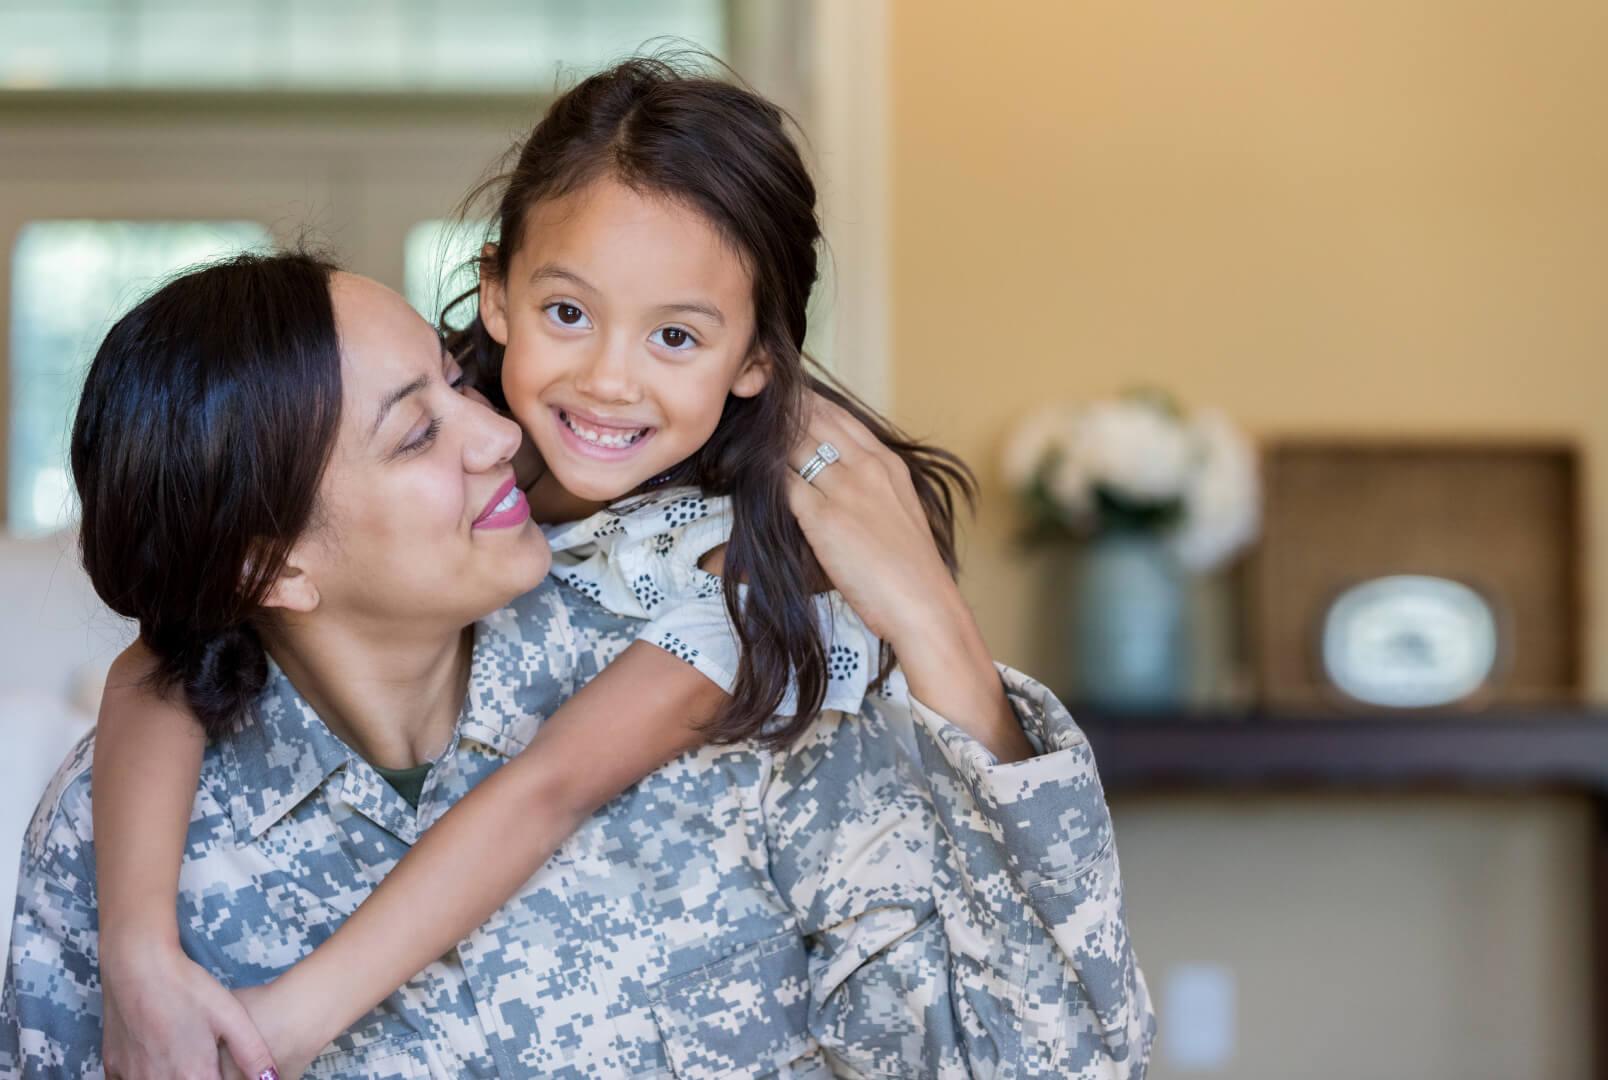 Rebuilding trust: Maintenance hazards & multifamily opportunities in military housing